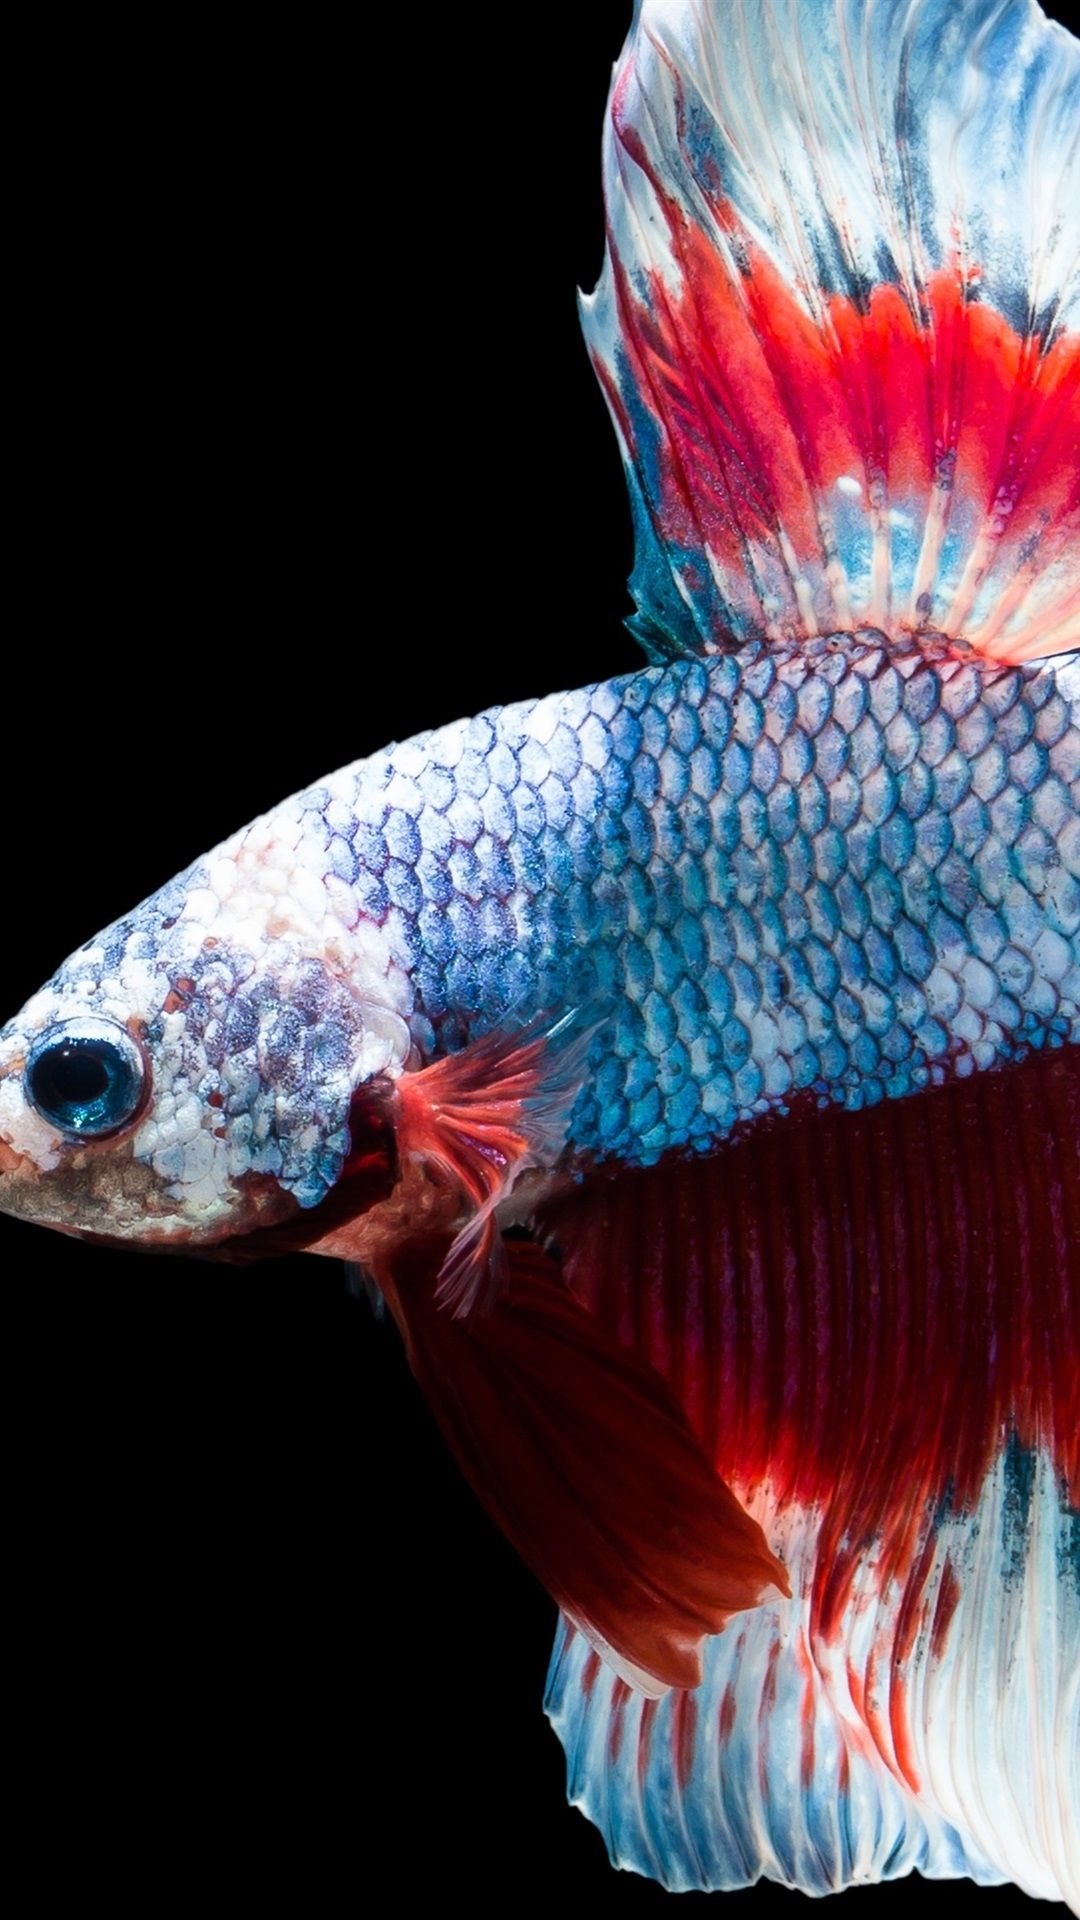 Fish Clean Cool iPhone Wallpaper